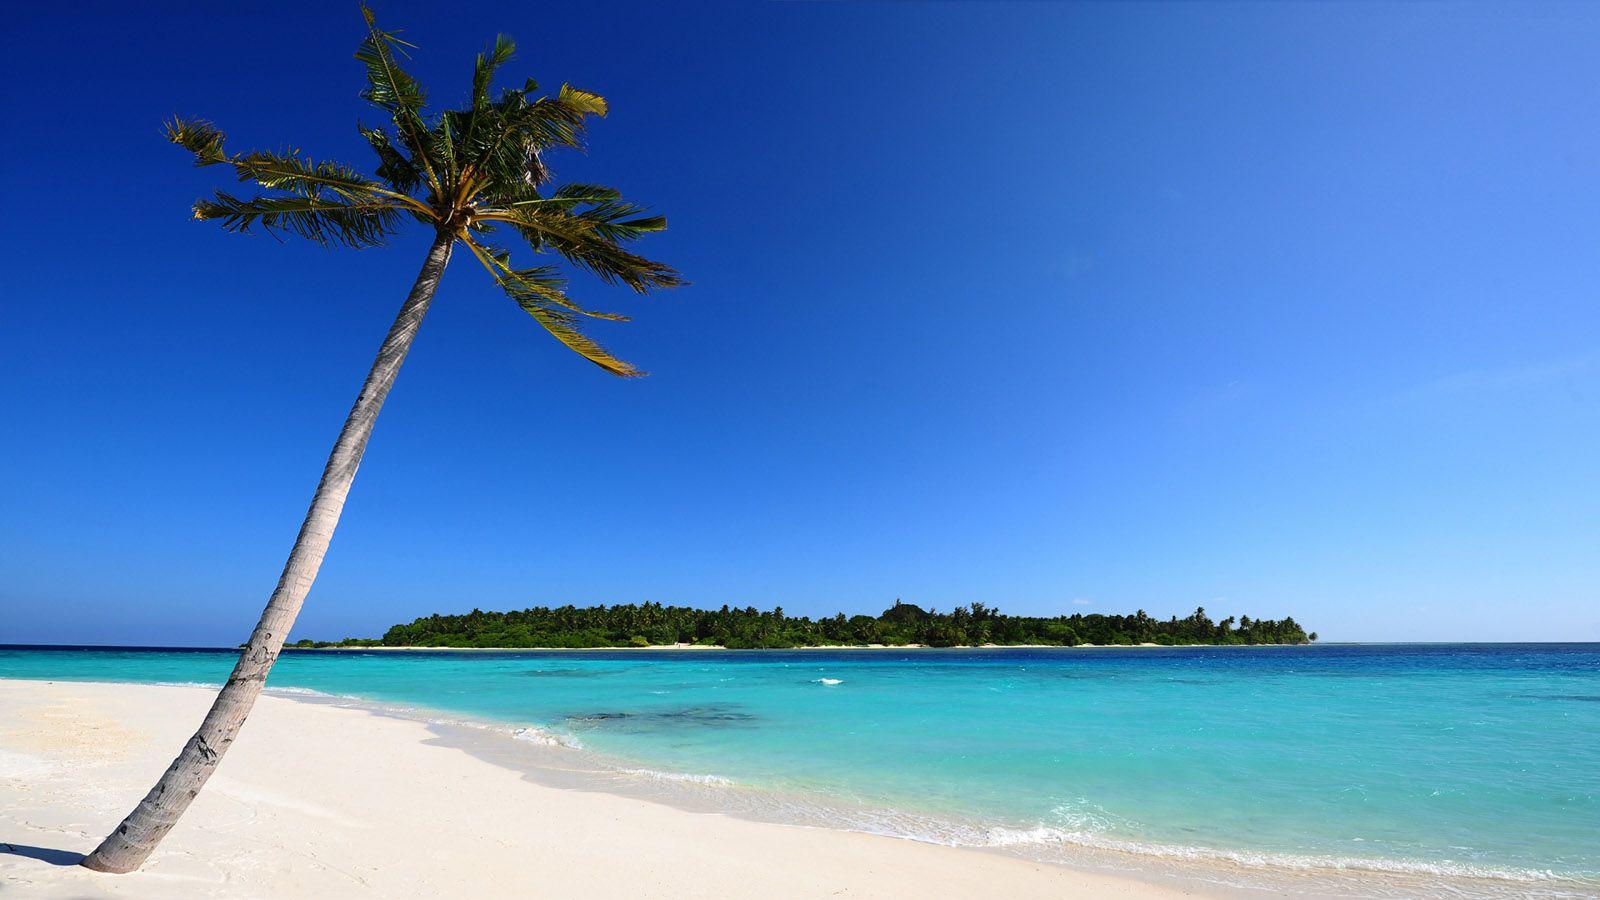 Panoramic Maldivian Beach Wallpaper